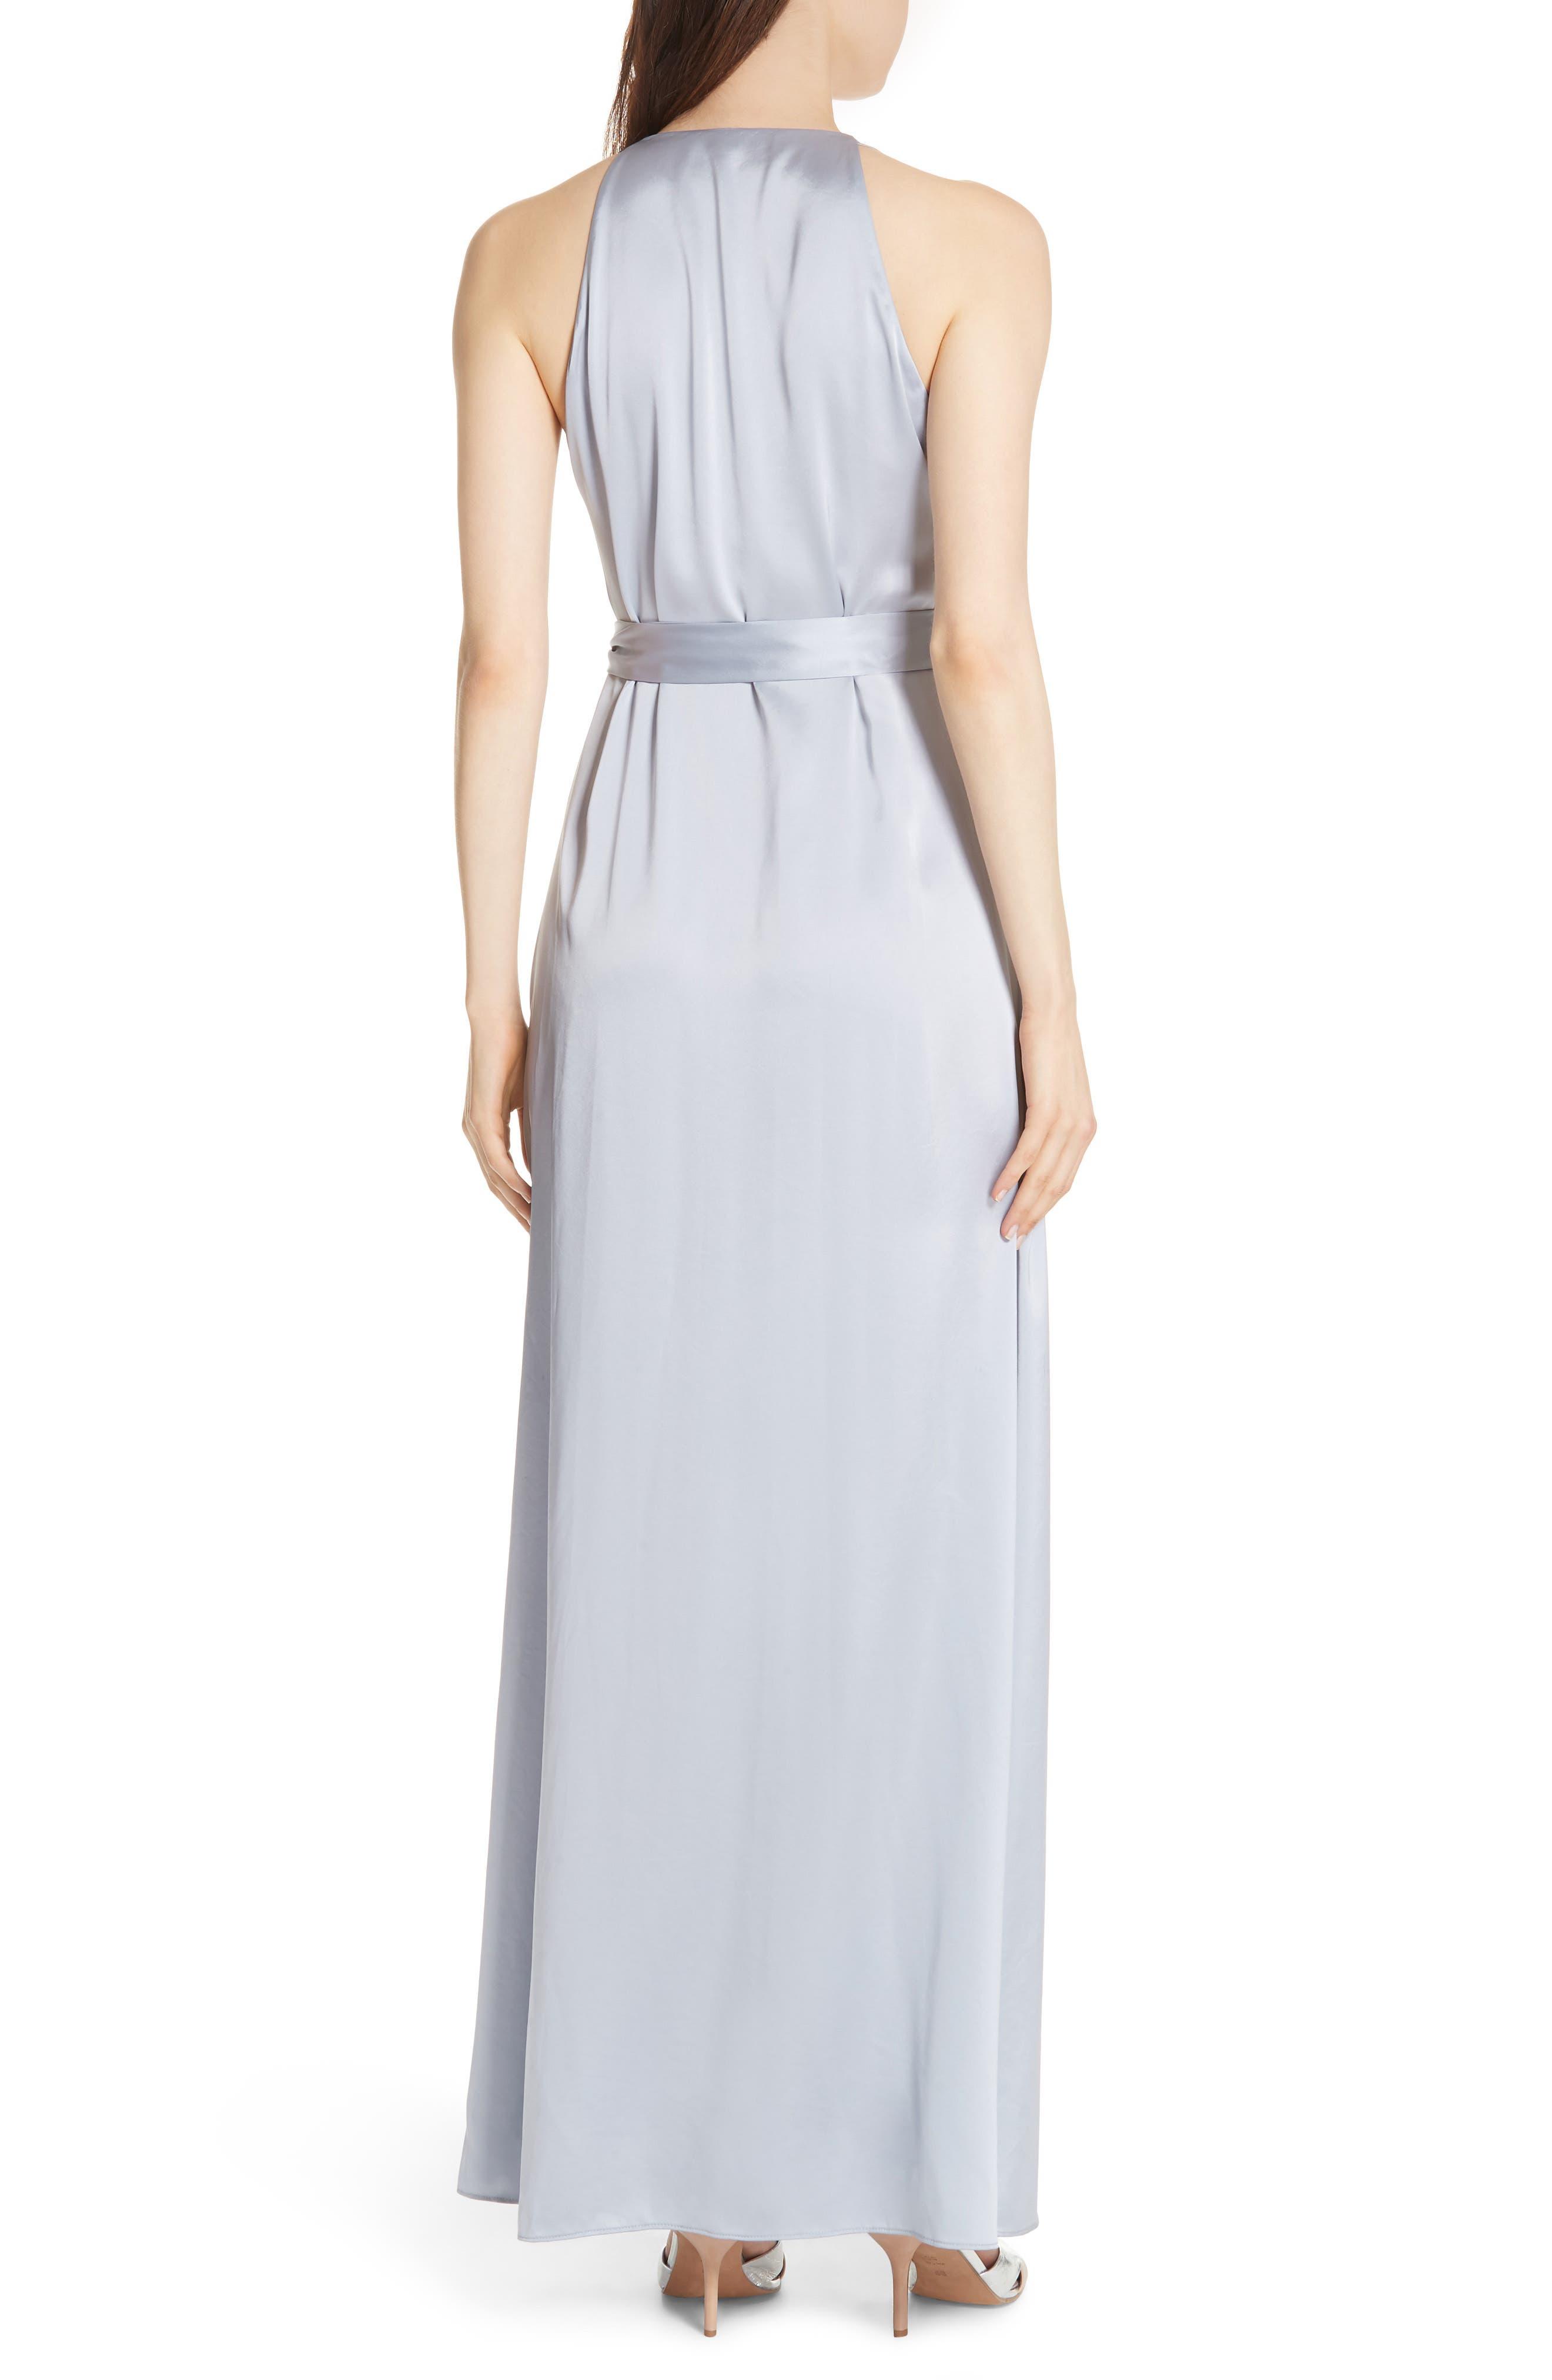 Diane von Furstenberg Wrap Gown,                             Alternate thumbnail 2, color,                             031